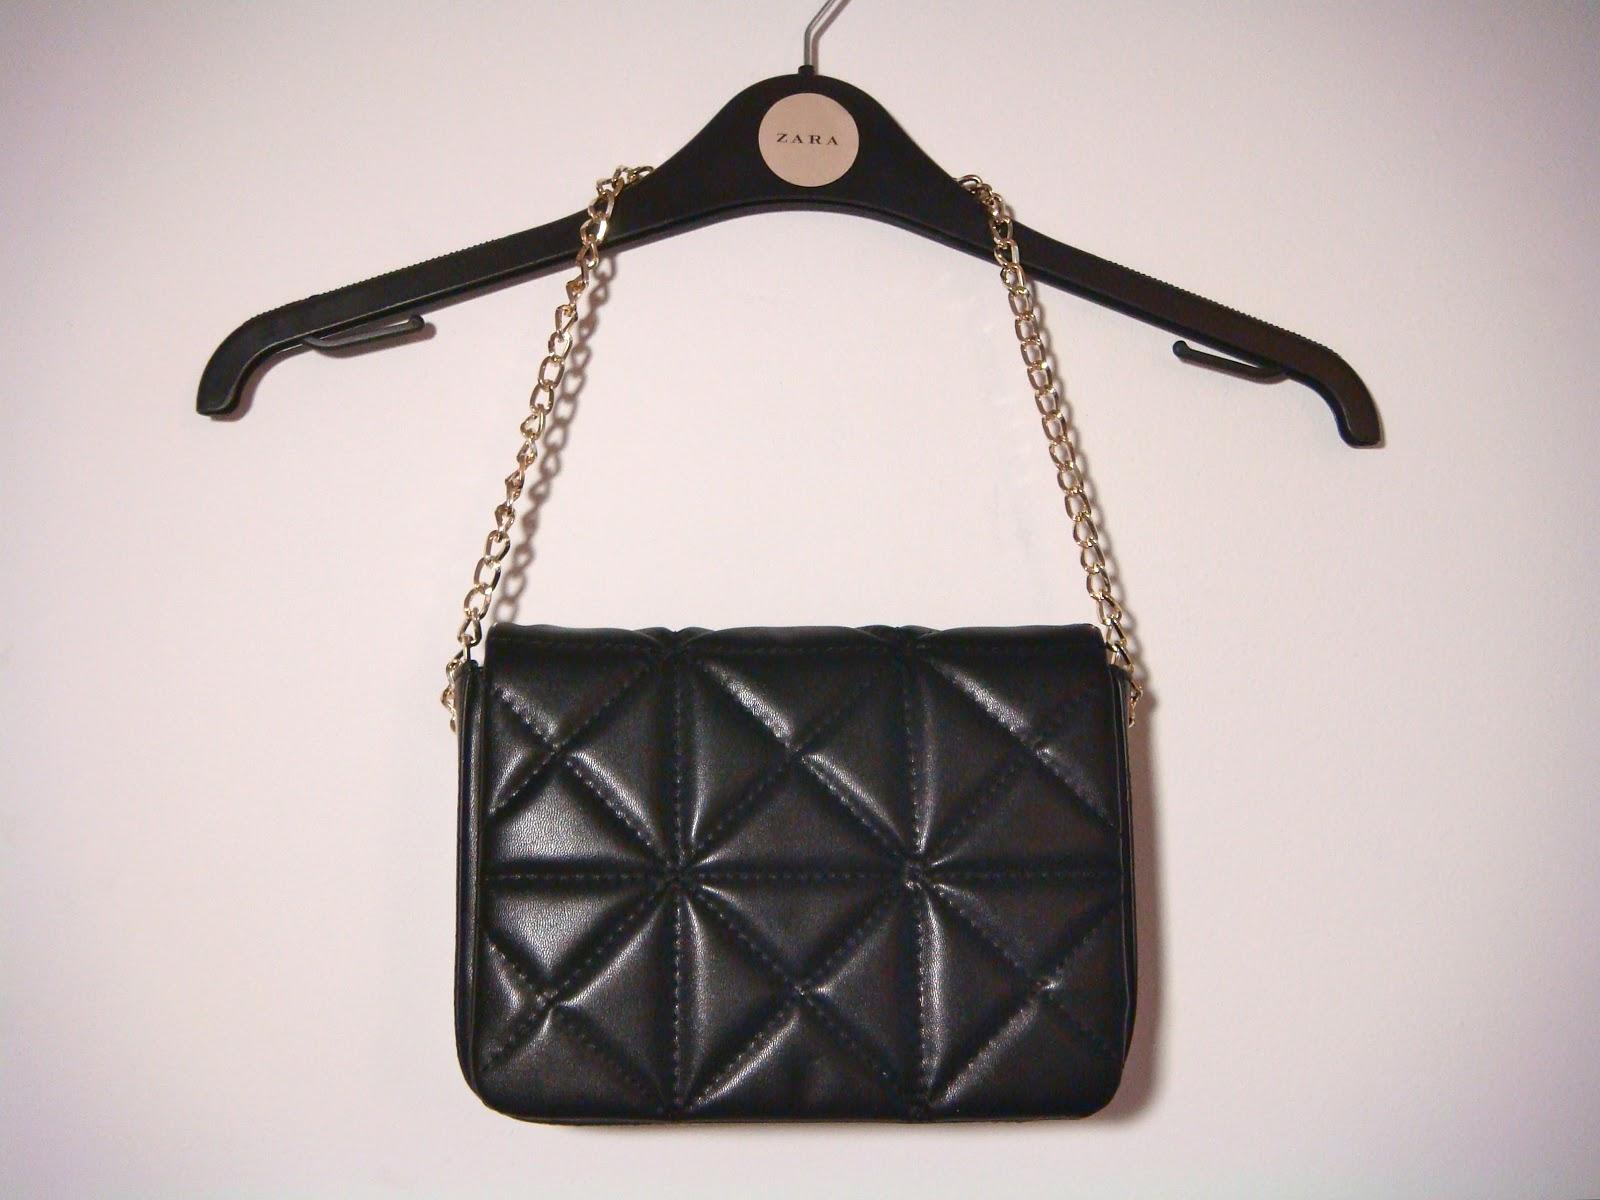 Zara Mini Quilted Shoulder Bag Review 40